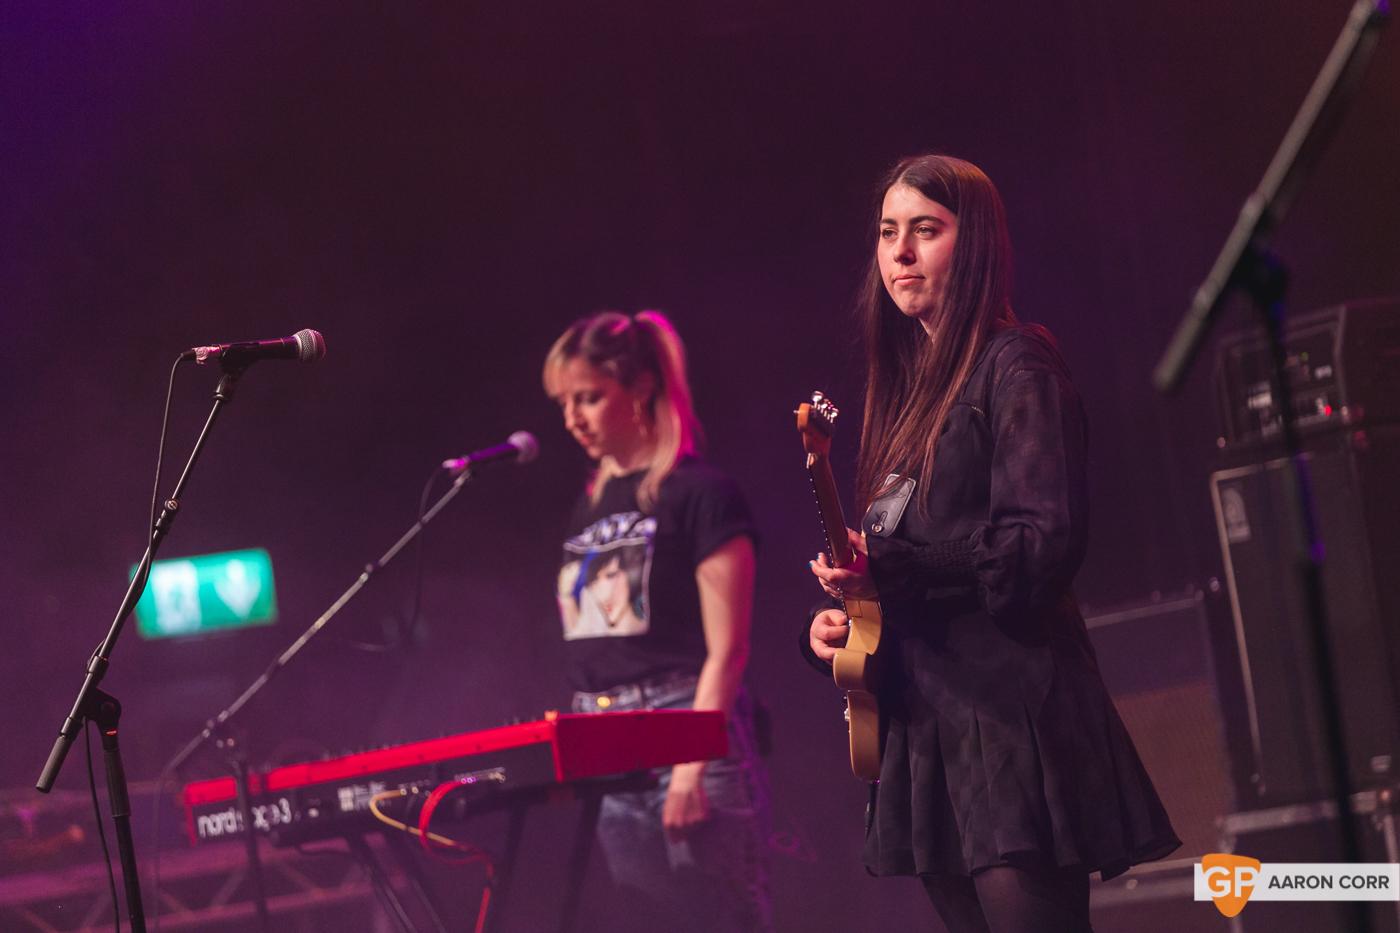 Sorcha Richardson at Choice Music Prize 2020 in Vicar Street, Dublin on 05-Mar-20 by Aaron Corr-5269